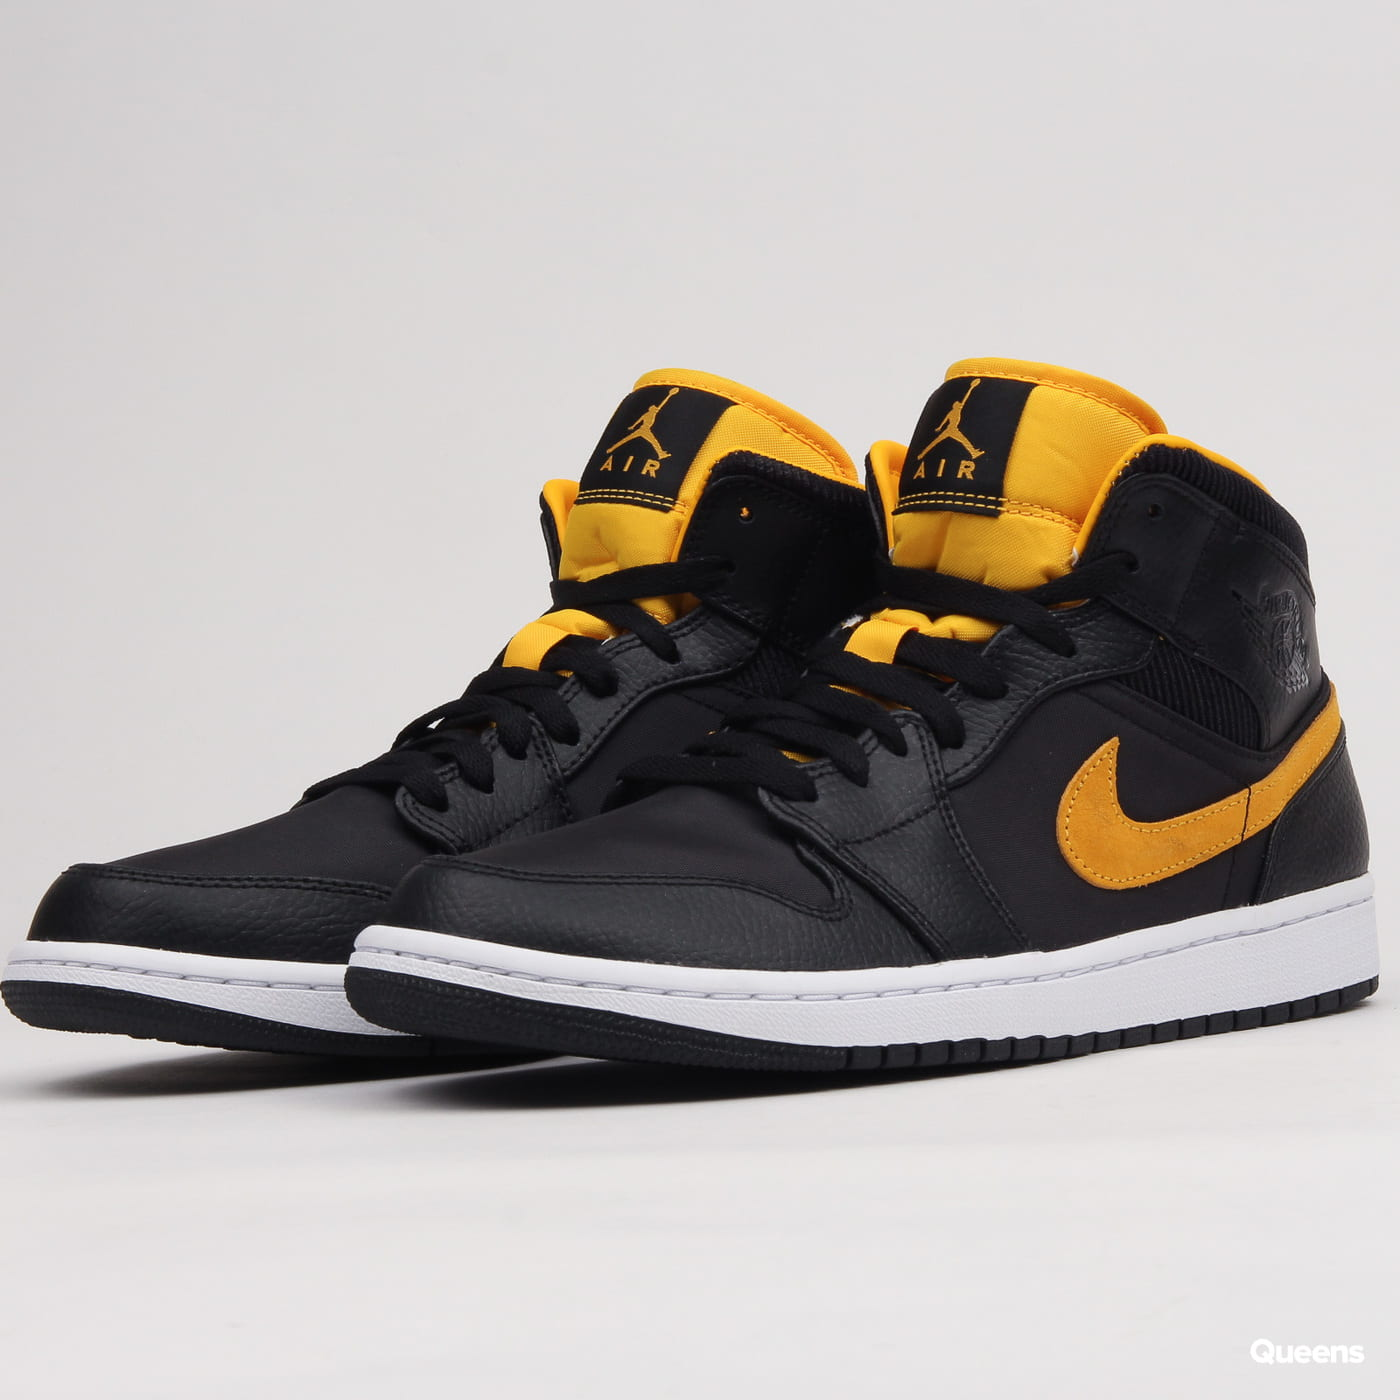 4f9c02bc32b Sneakers Jordan Air Jordan 1 Mid SE black / university gold - white  (CI9352-001) – Queens 💚